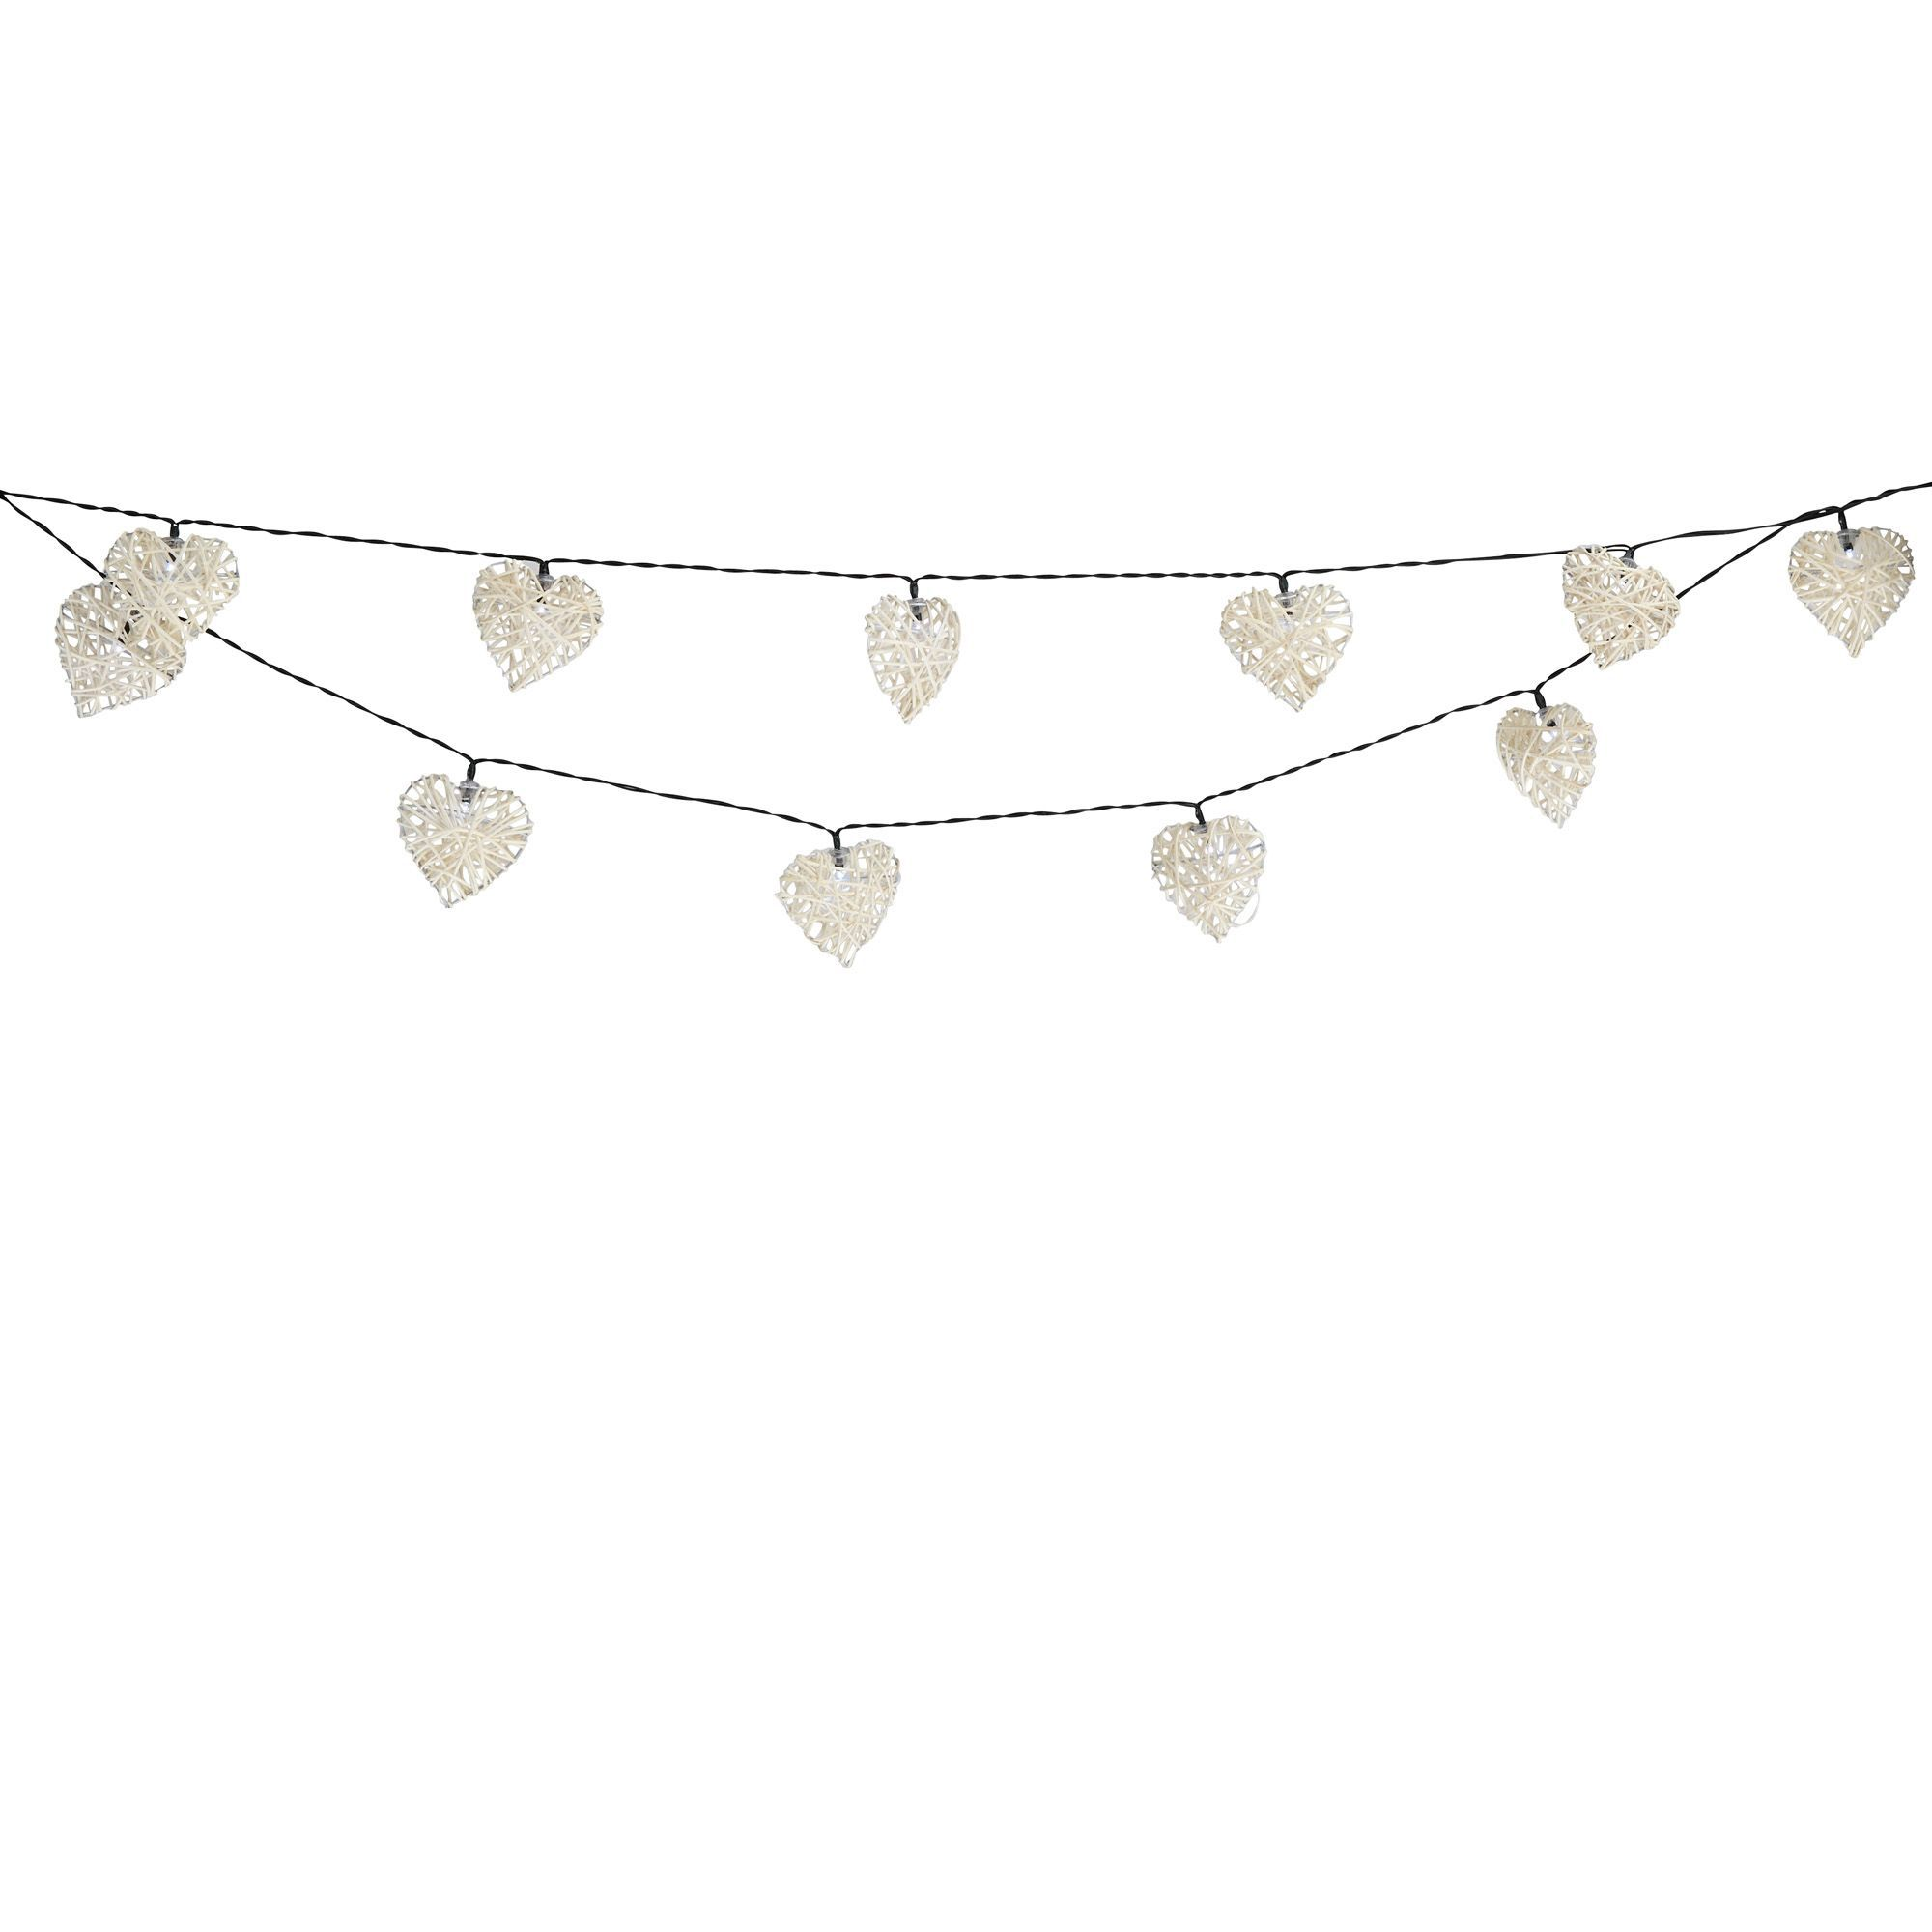 Driveway Lights B Q: Blooma Valenti Heart Solar Powered White 20 LED String